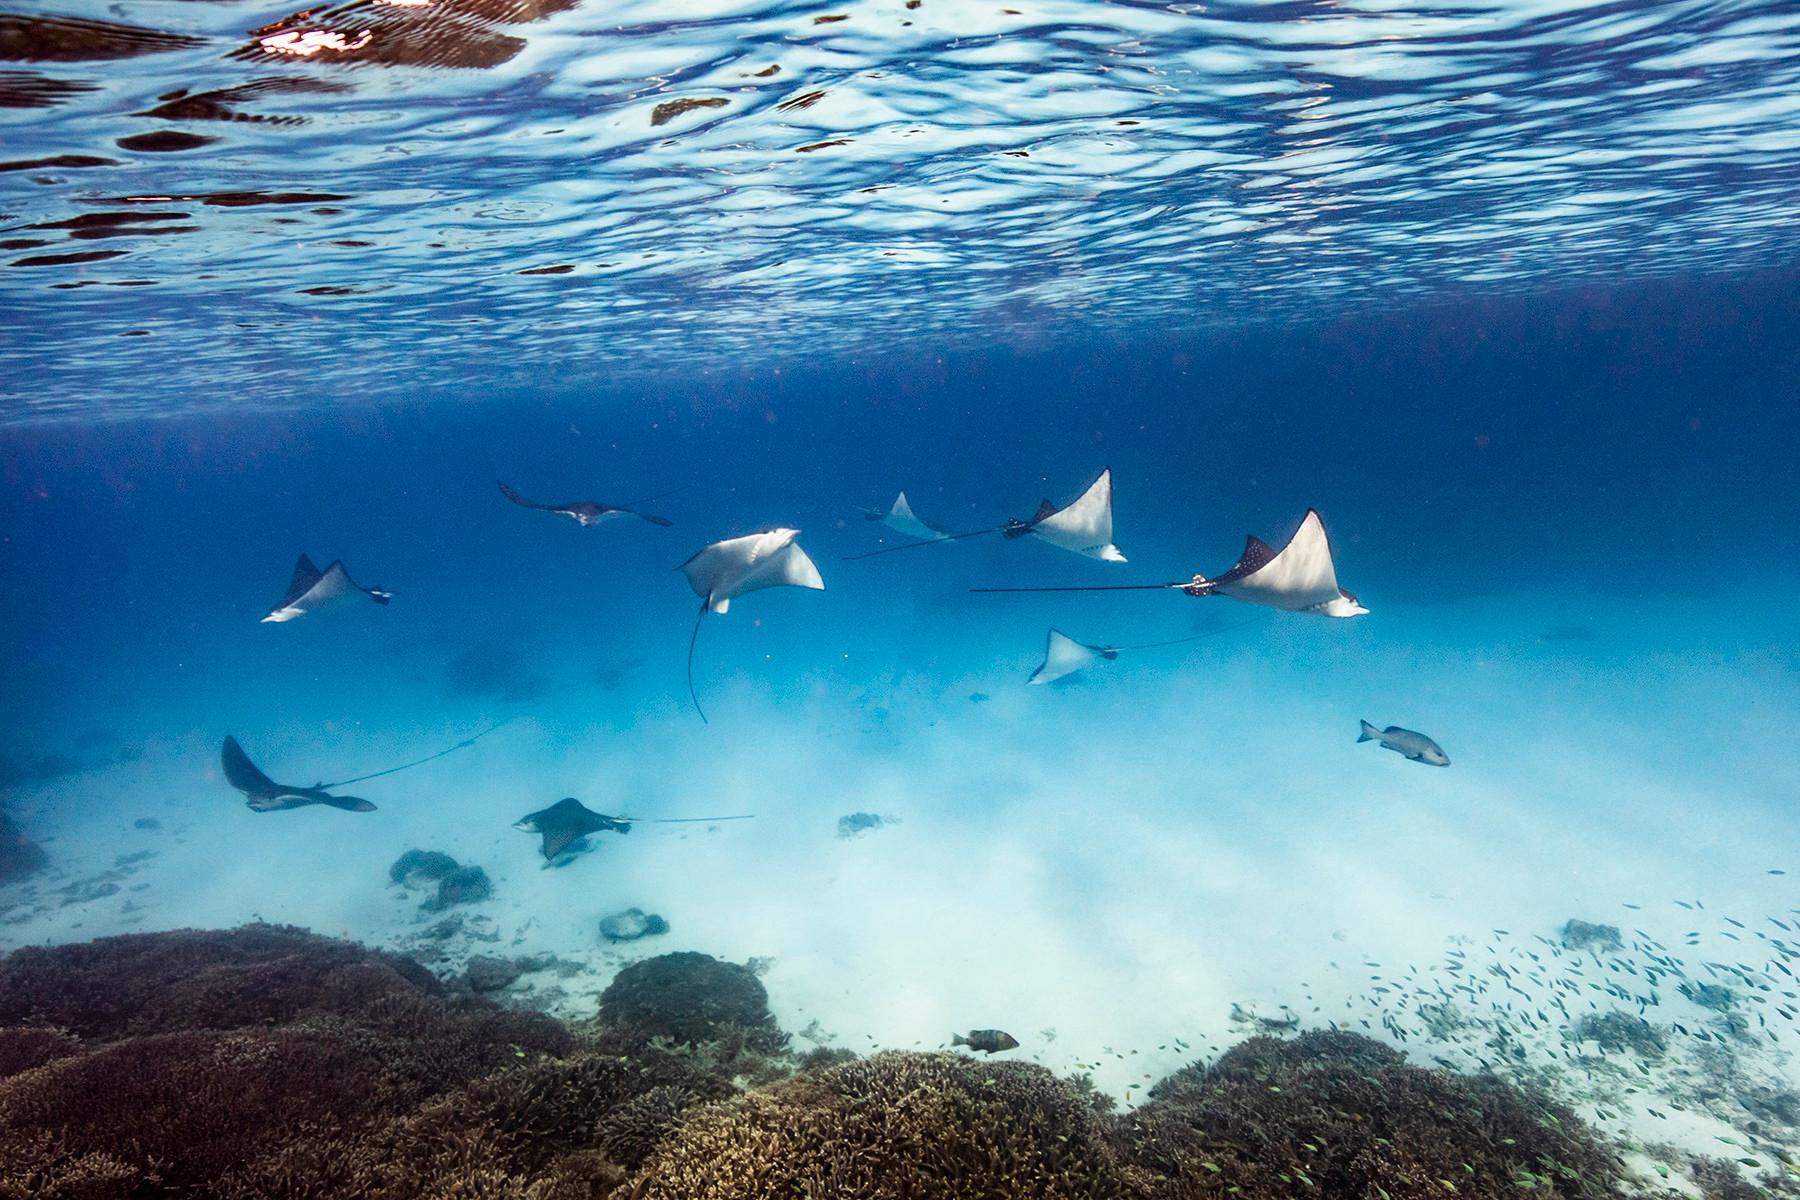 Manta Ray migration